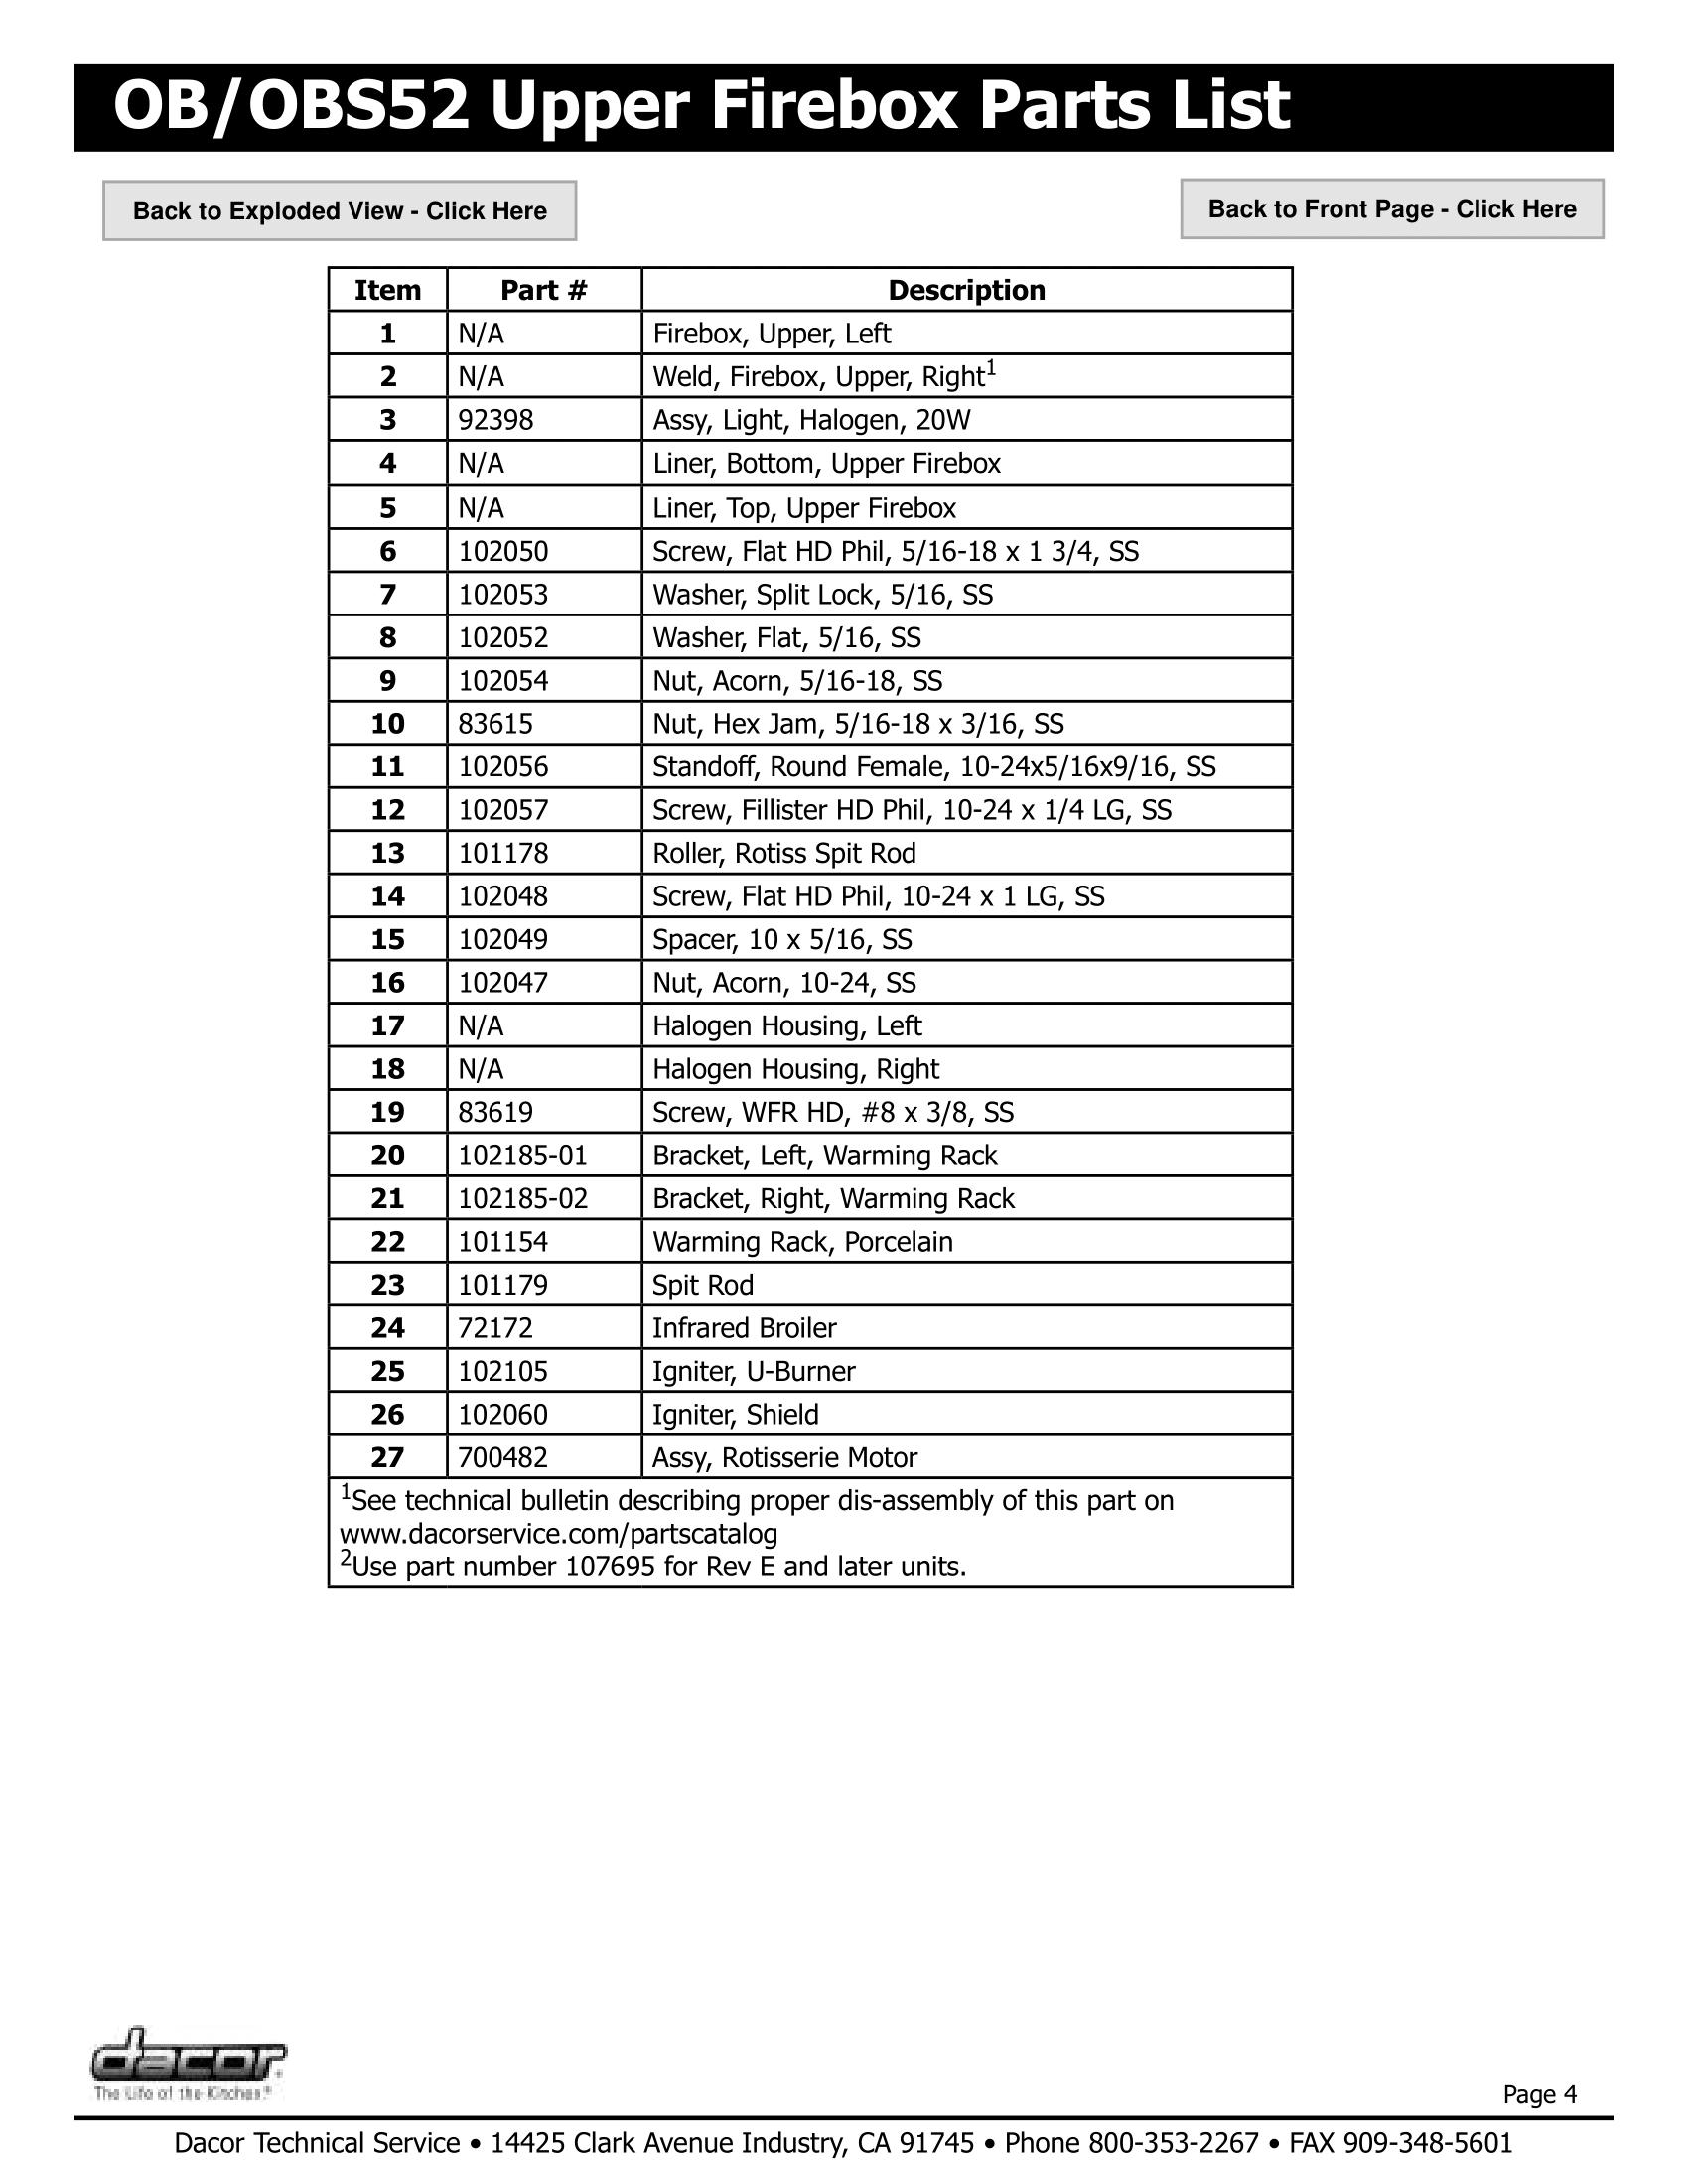 Dacor OB52 Upper Firebox Parts List